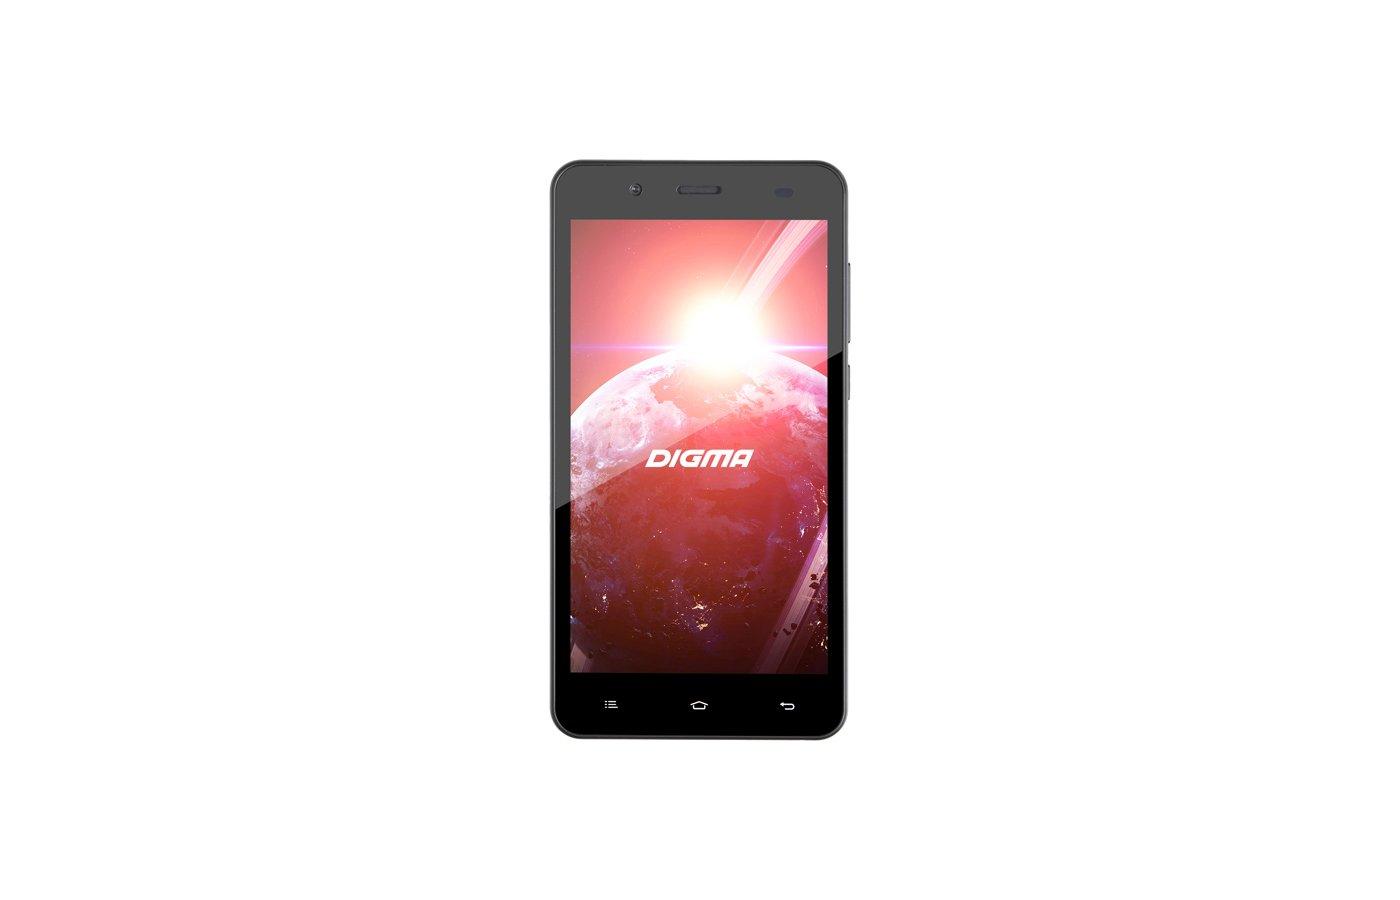 Смартфон Digma C500 3G Linx 4Gb graphite